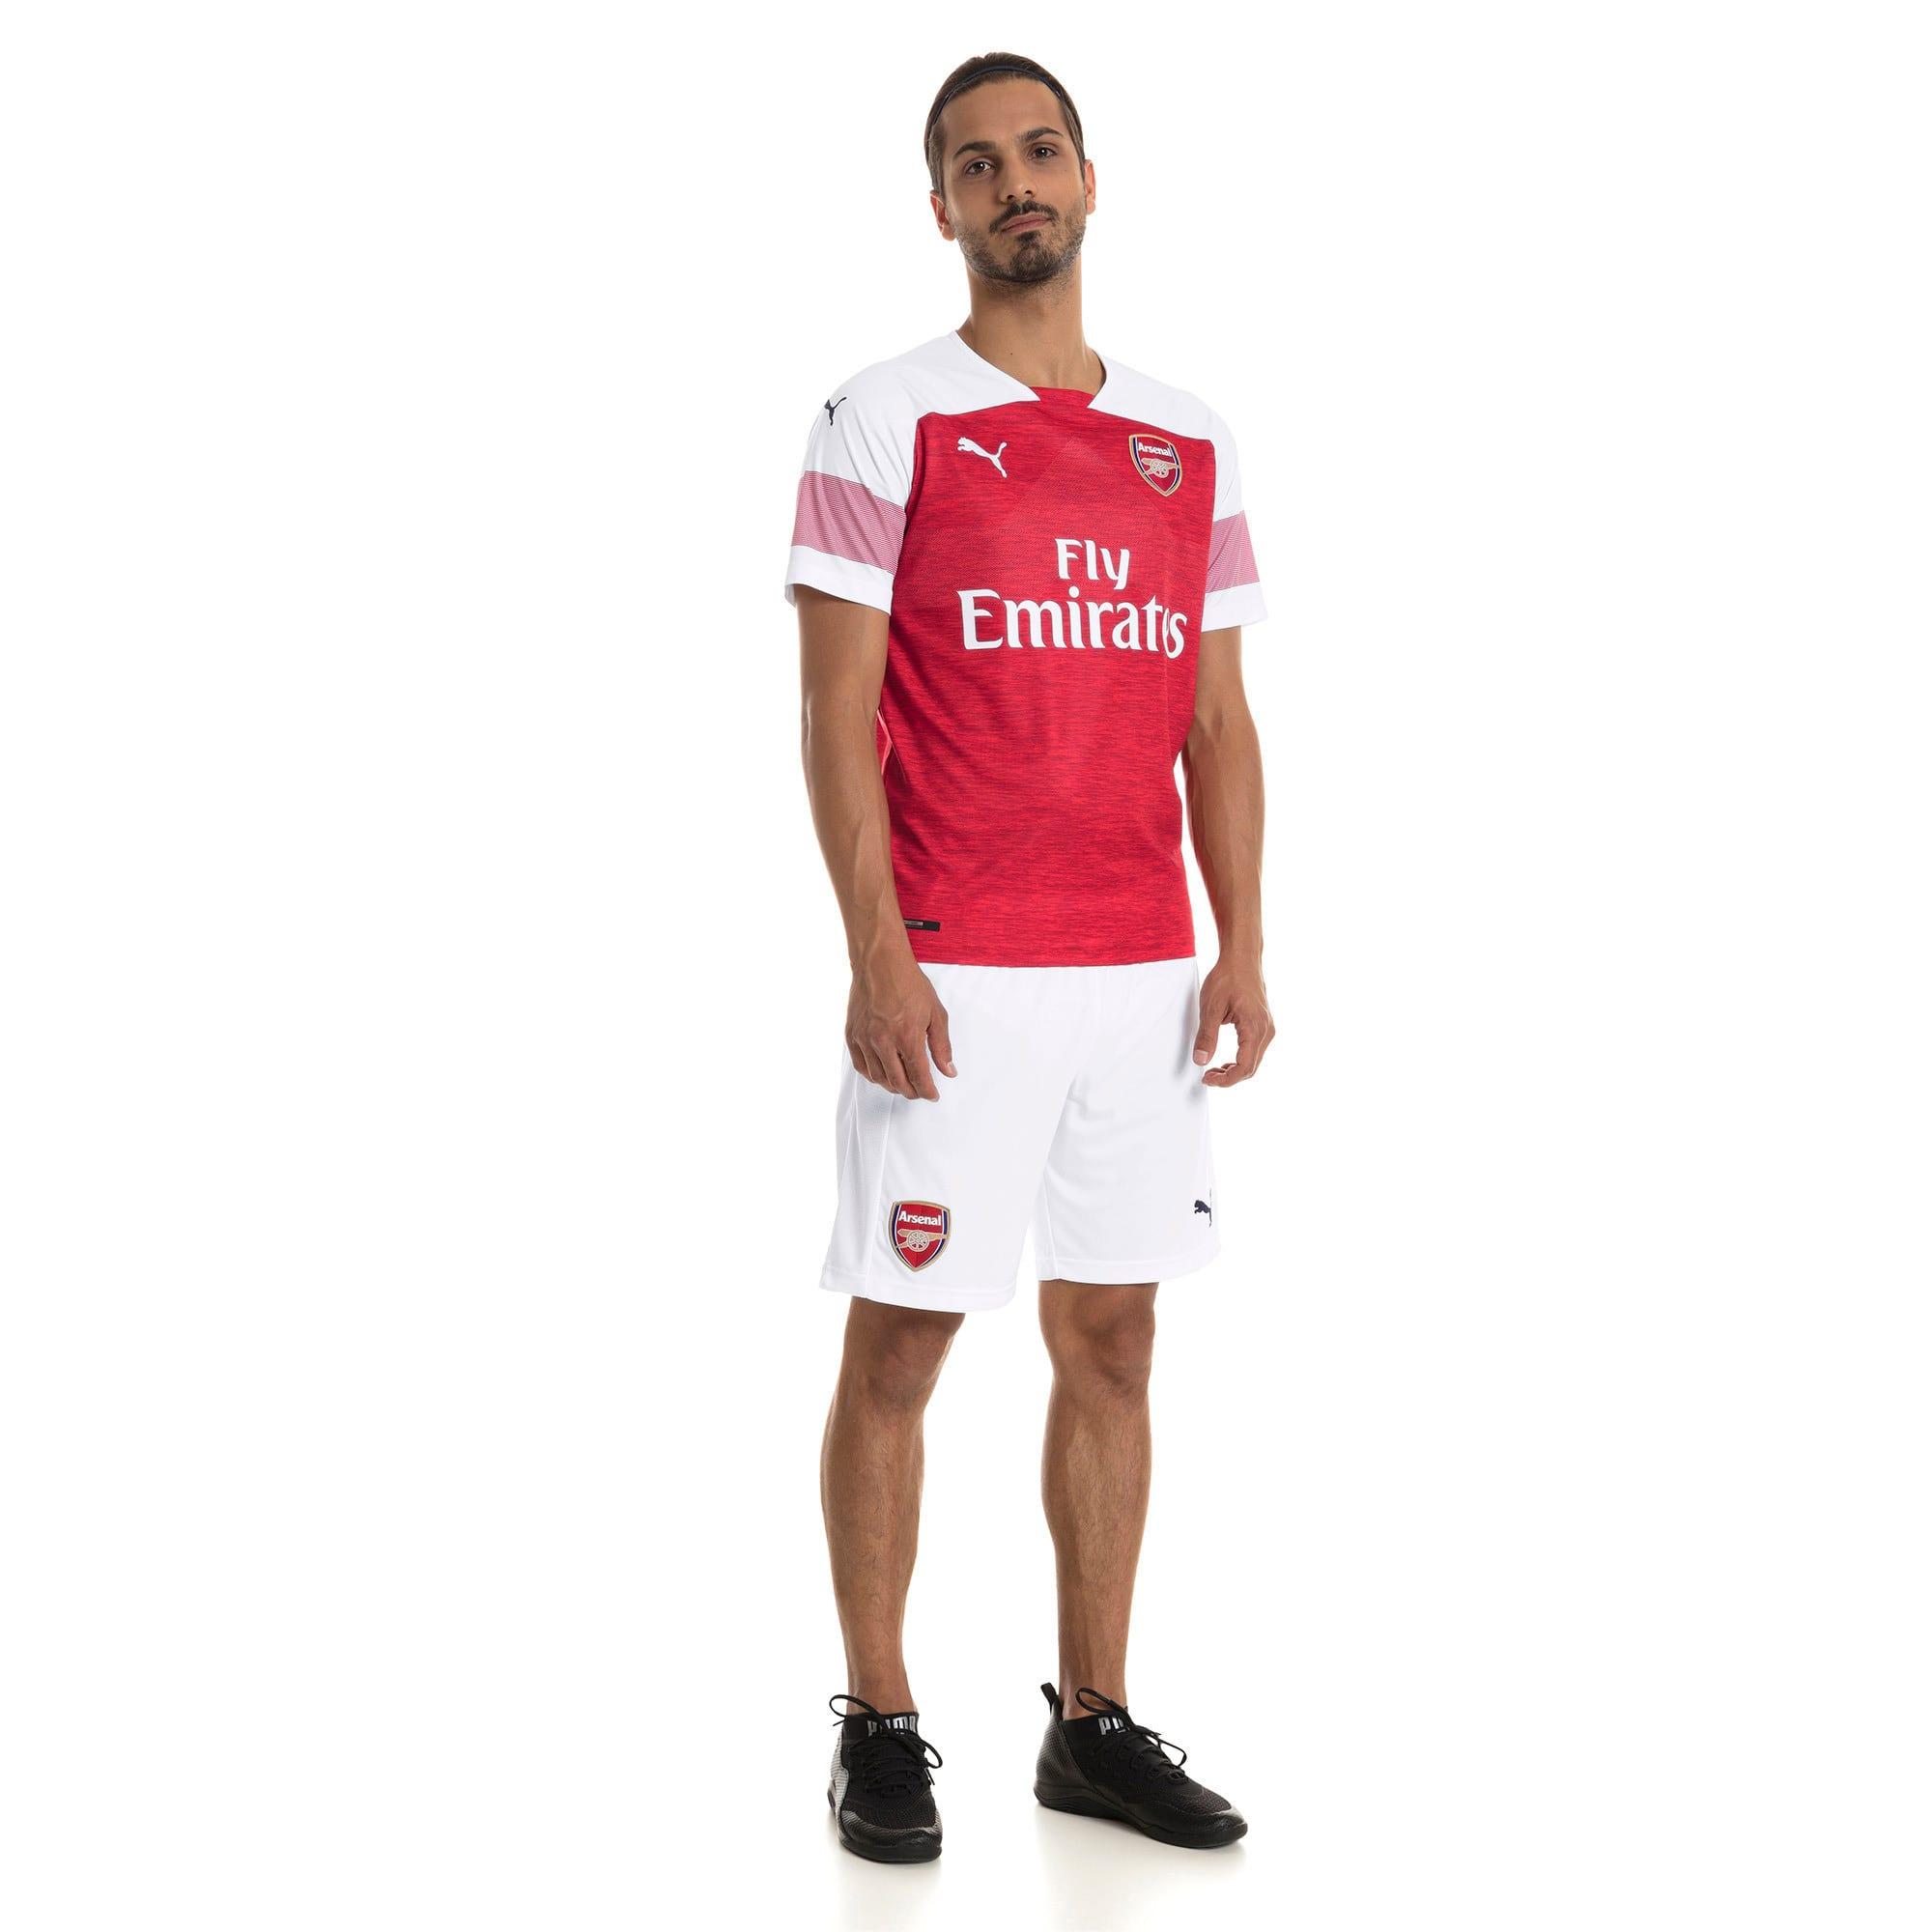 Thumbnail 3 of Arsenal 2018/19 Home Replica Jersey, -Chili Pepper Heather-White, medium